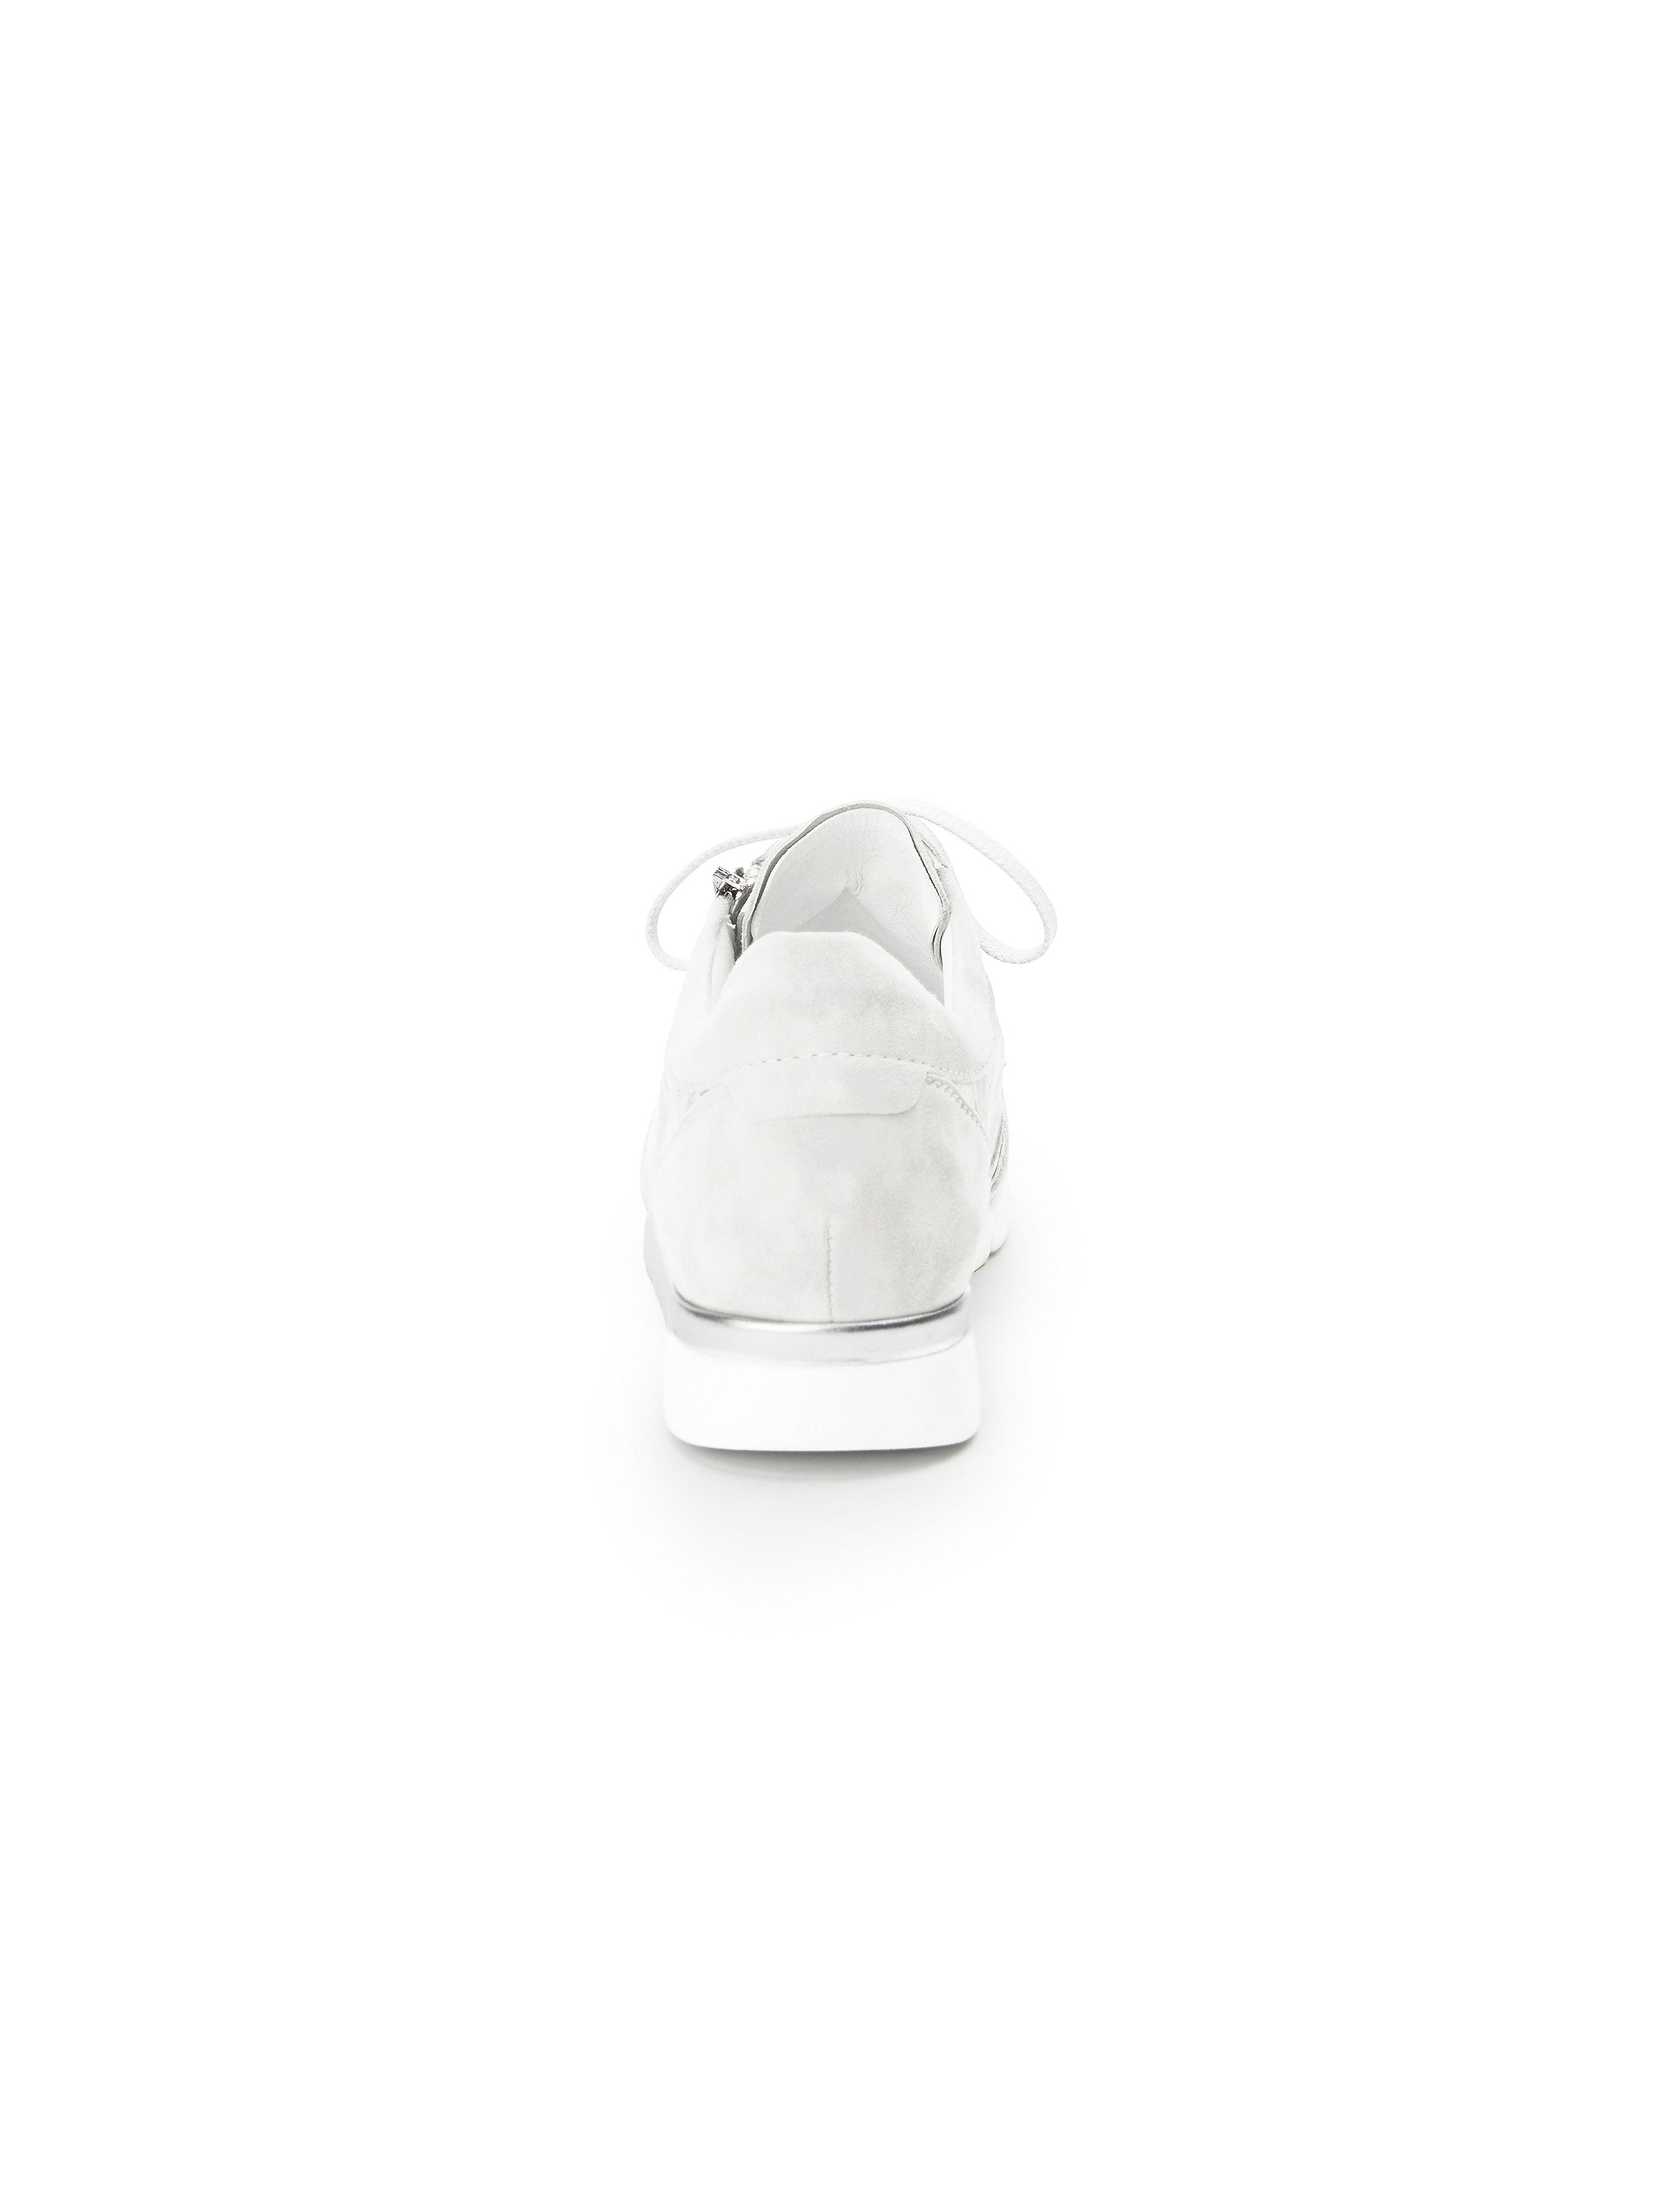 Semler - Sneaker - Nelly aus 100% Leder - Sneaker Steingrau/Silber Gute Qualität beliebte Schuhe 822260